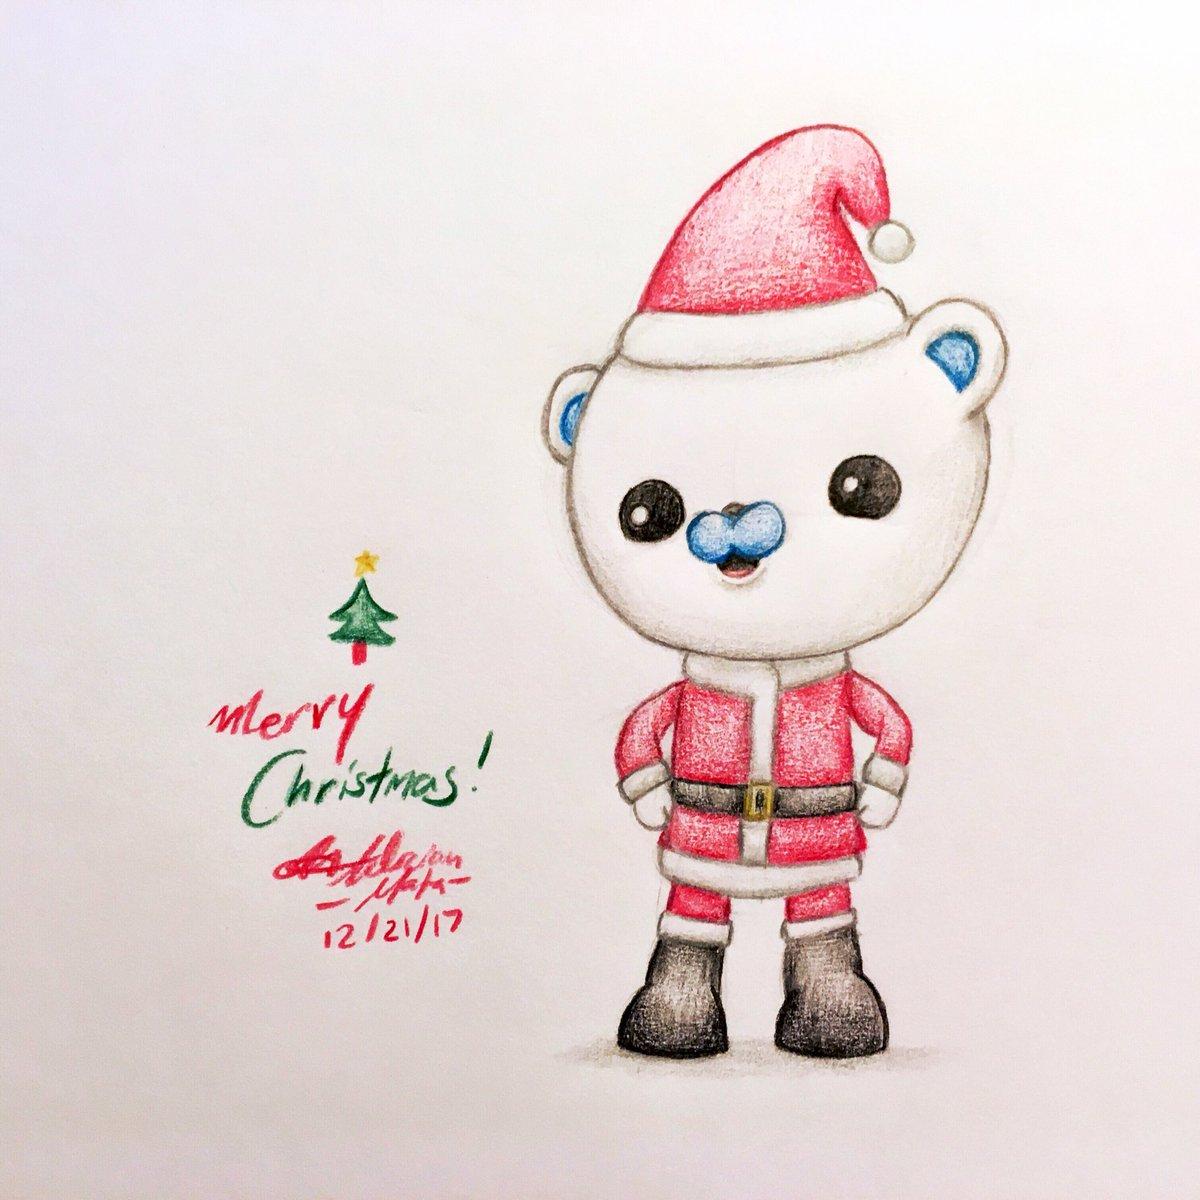 Octonaut Christmas.Adrian Mata On Twitter Santa Barnacles Wishes You A